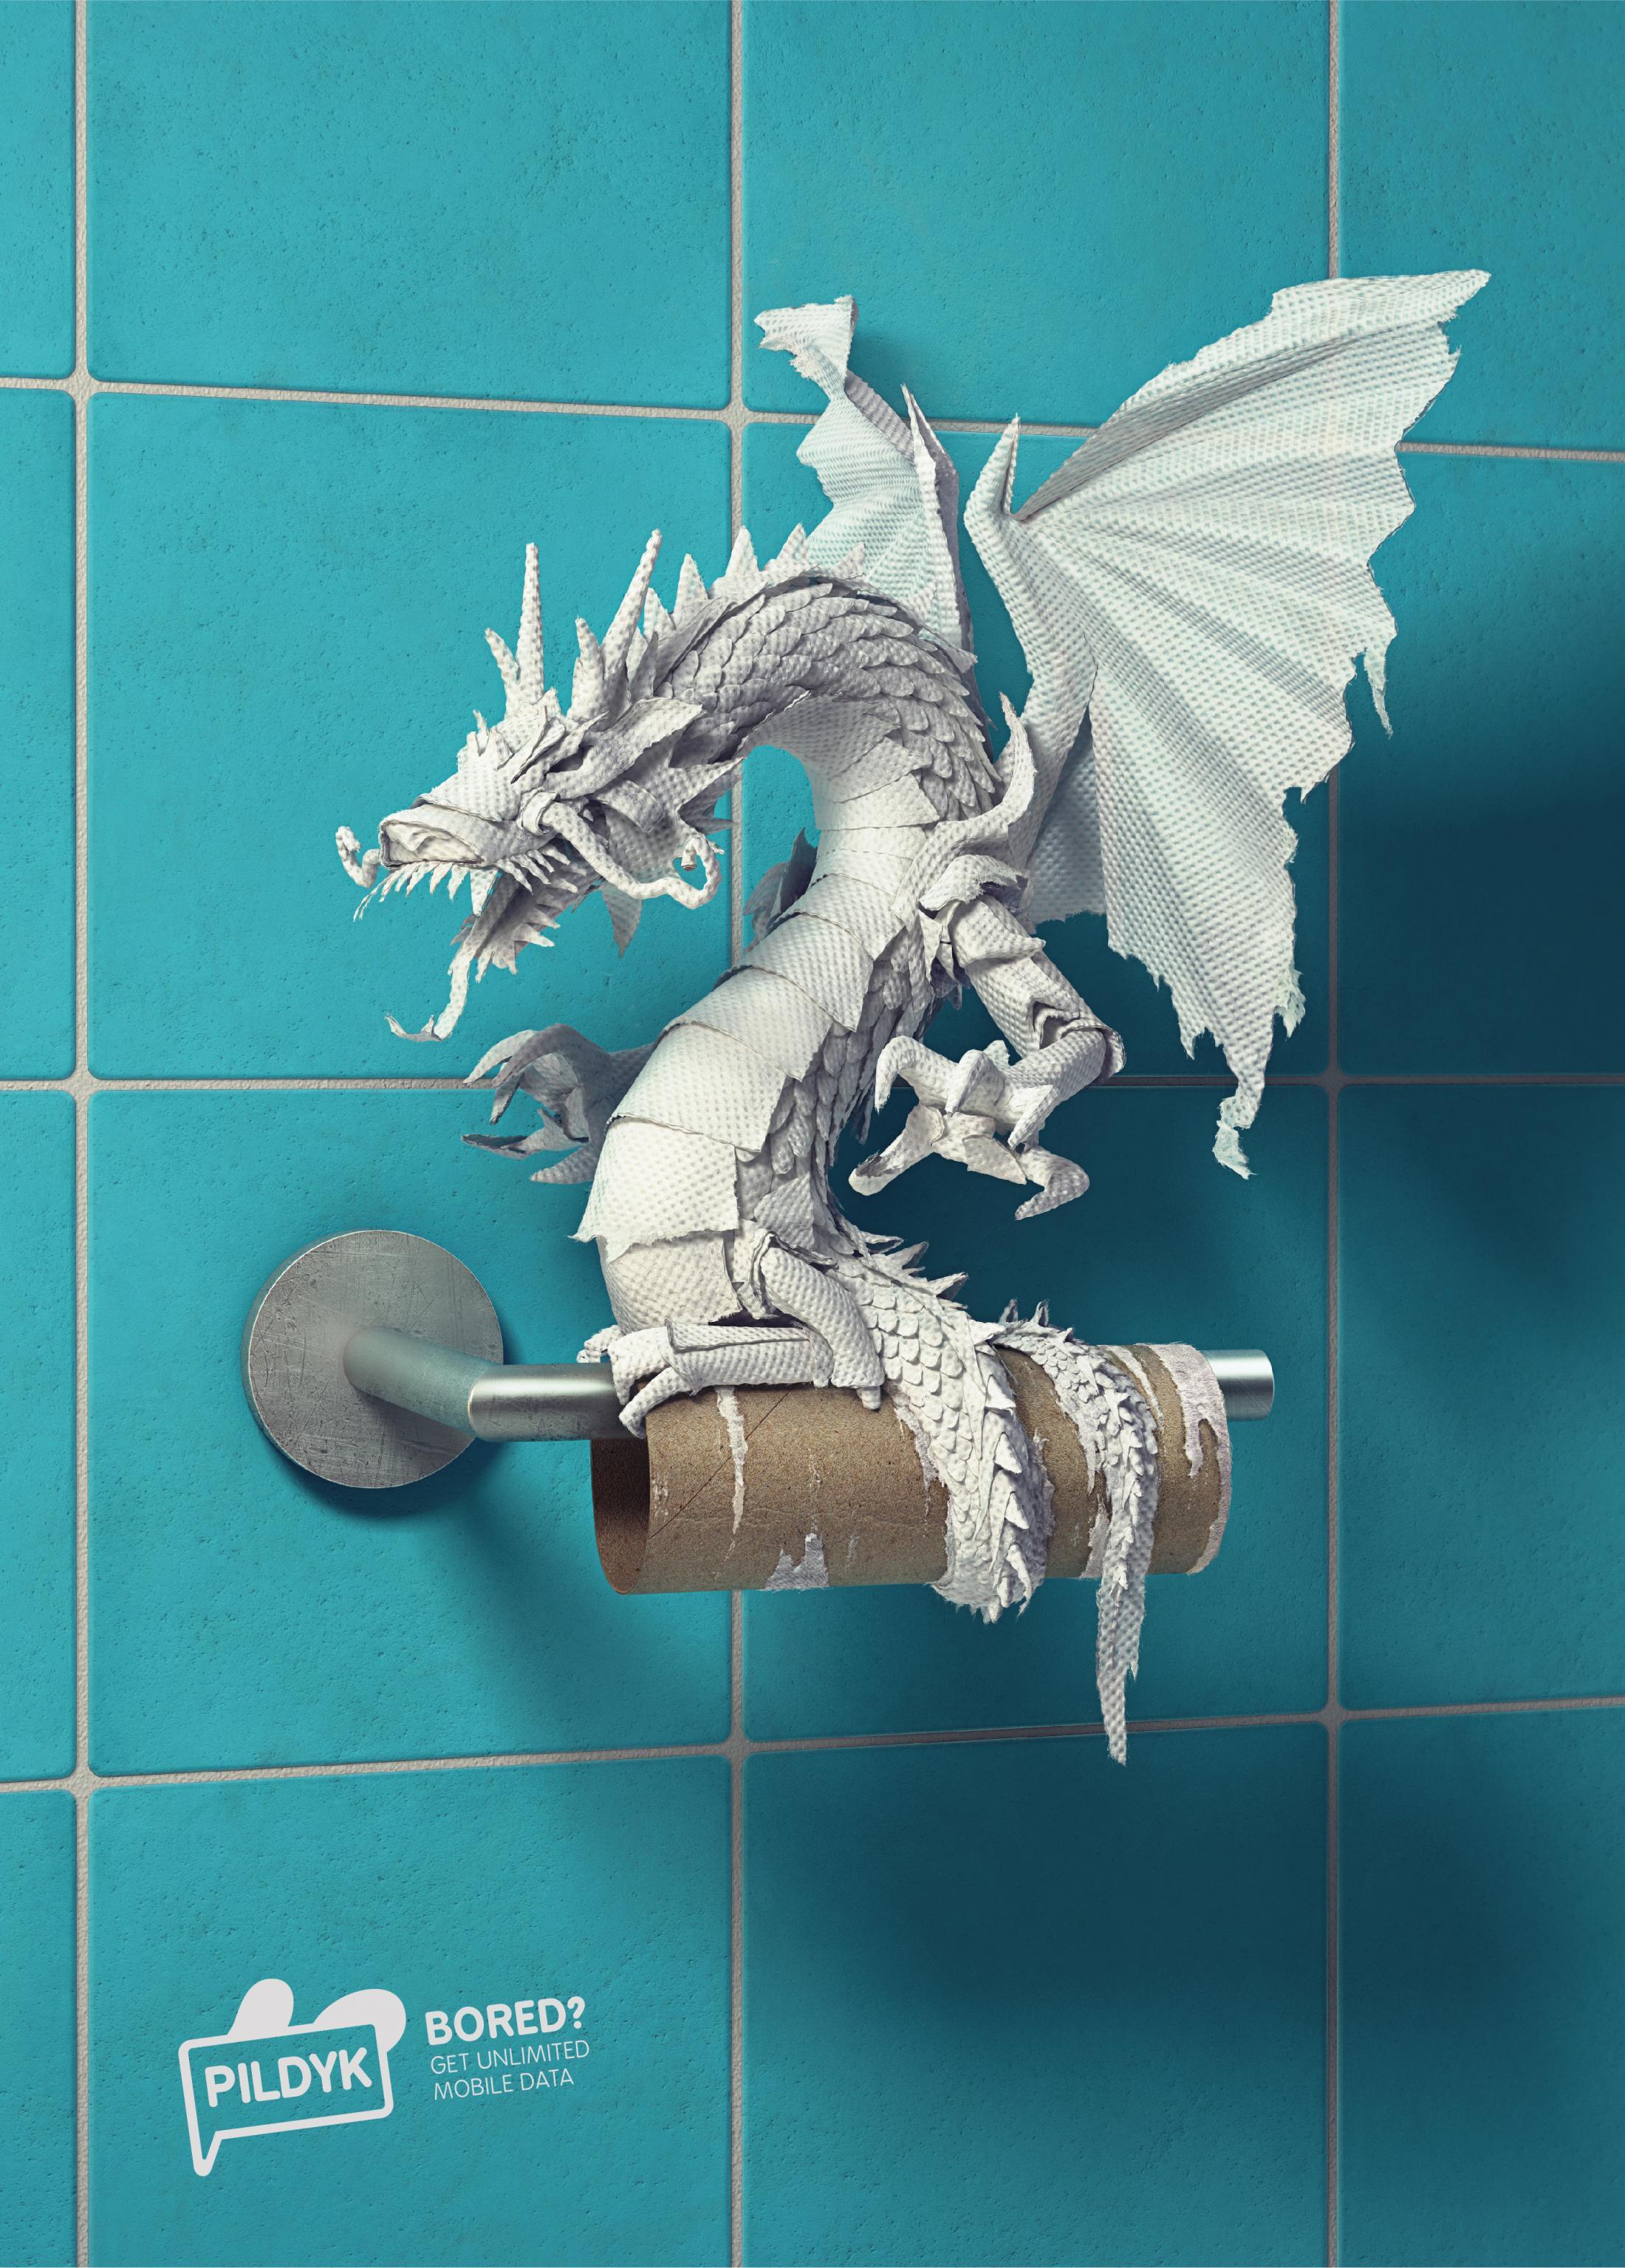 05.Pildyk Dragon.[大嘴收纳屋].Jpg